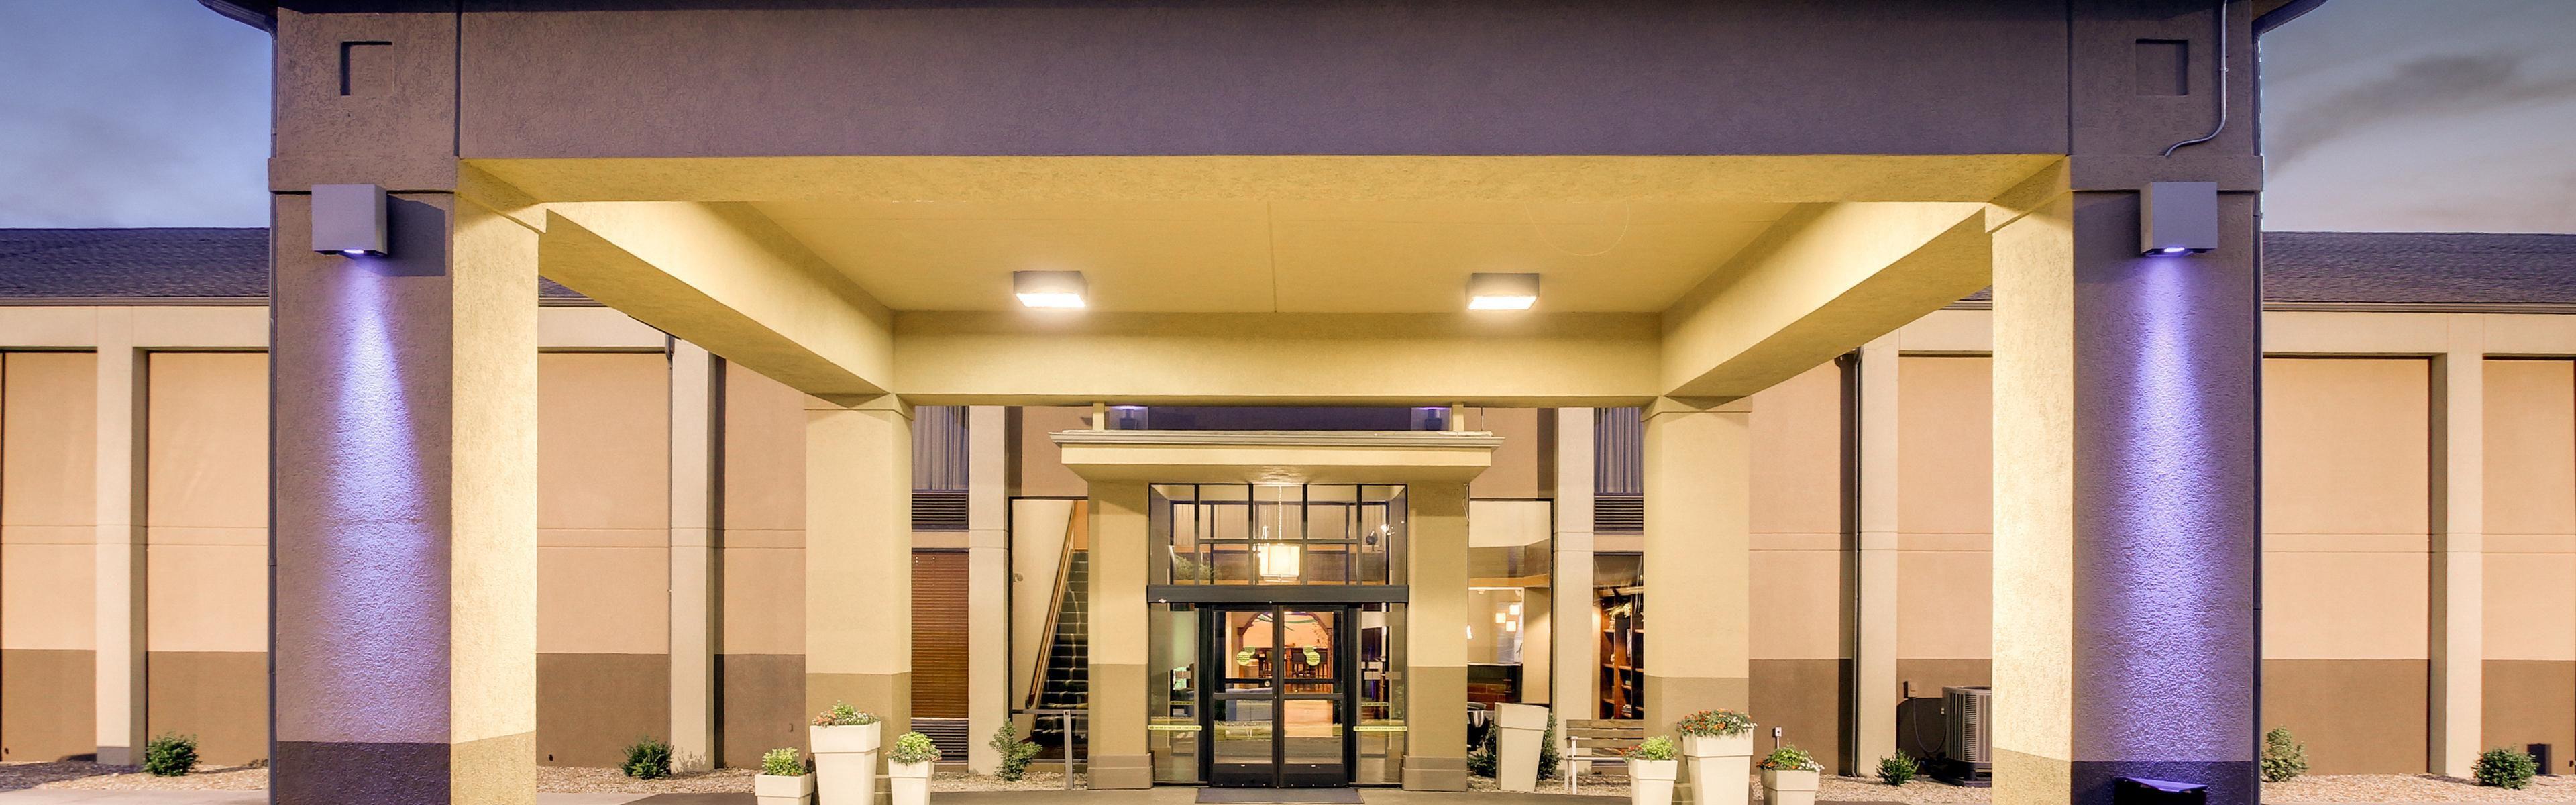 Holiday Inn Express Marshfield (Springfield Area) image 0